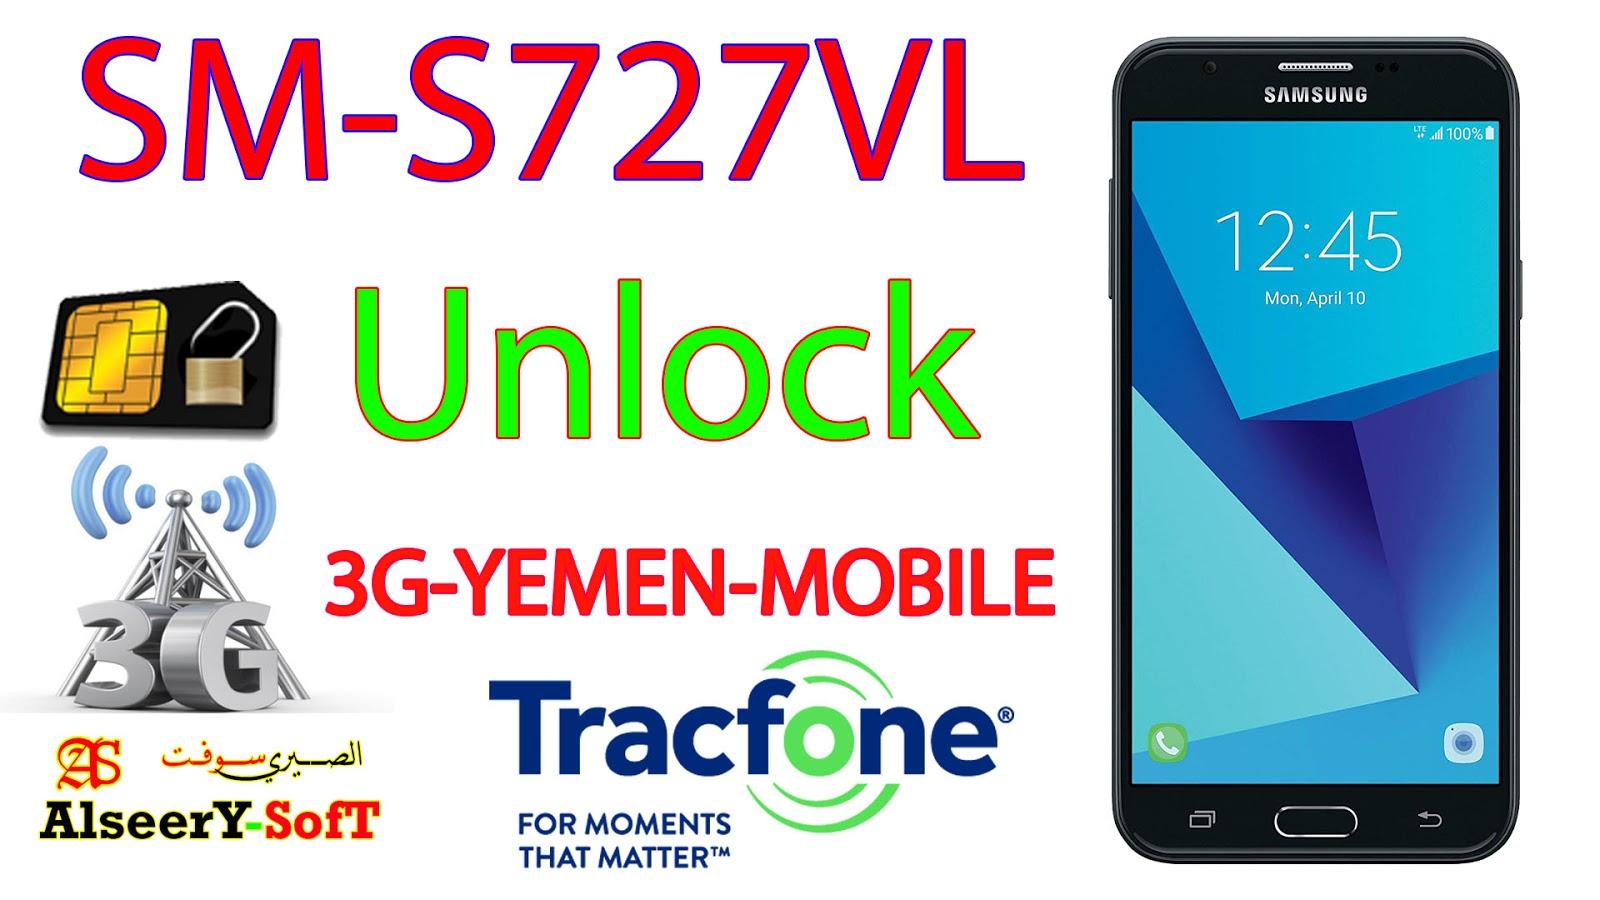 Unlock SAMSUNG J7 SM-S727VL TRACFONE - AlseerY SofT